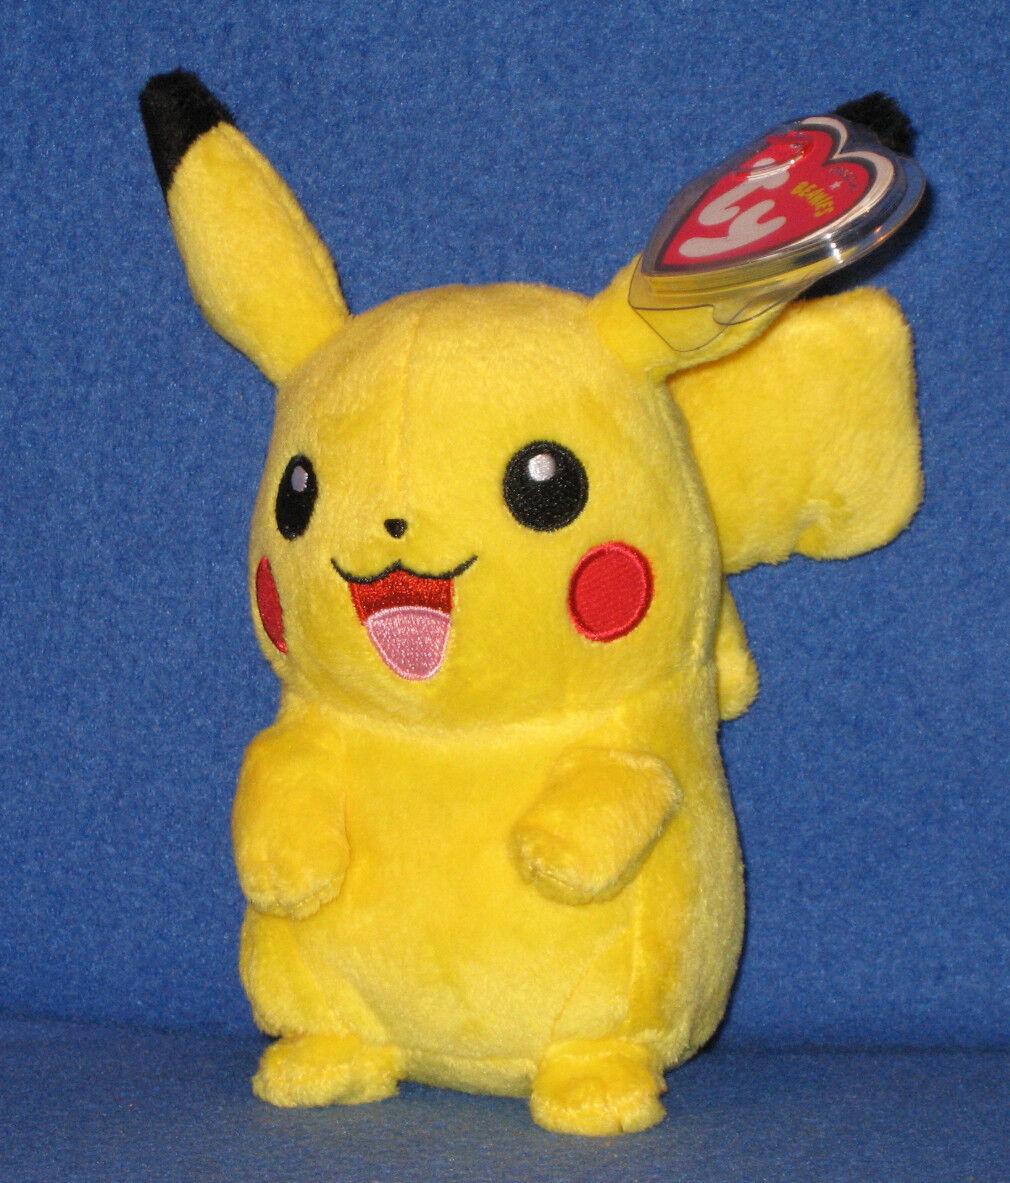 Ty pikachu pokemon beanie baby - minze mit minze tags - uk exklusive 6 zentimeter